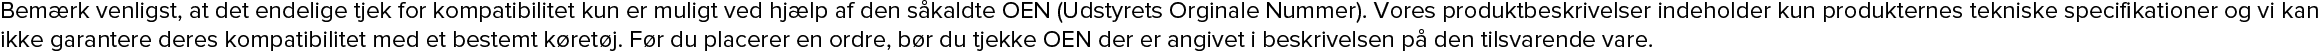 RIDEX 113855M1, 3658024, 4198305A, 1-M00303, 2-80199161 Luftfilter